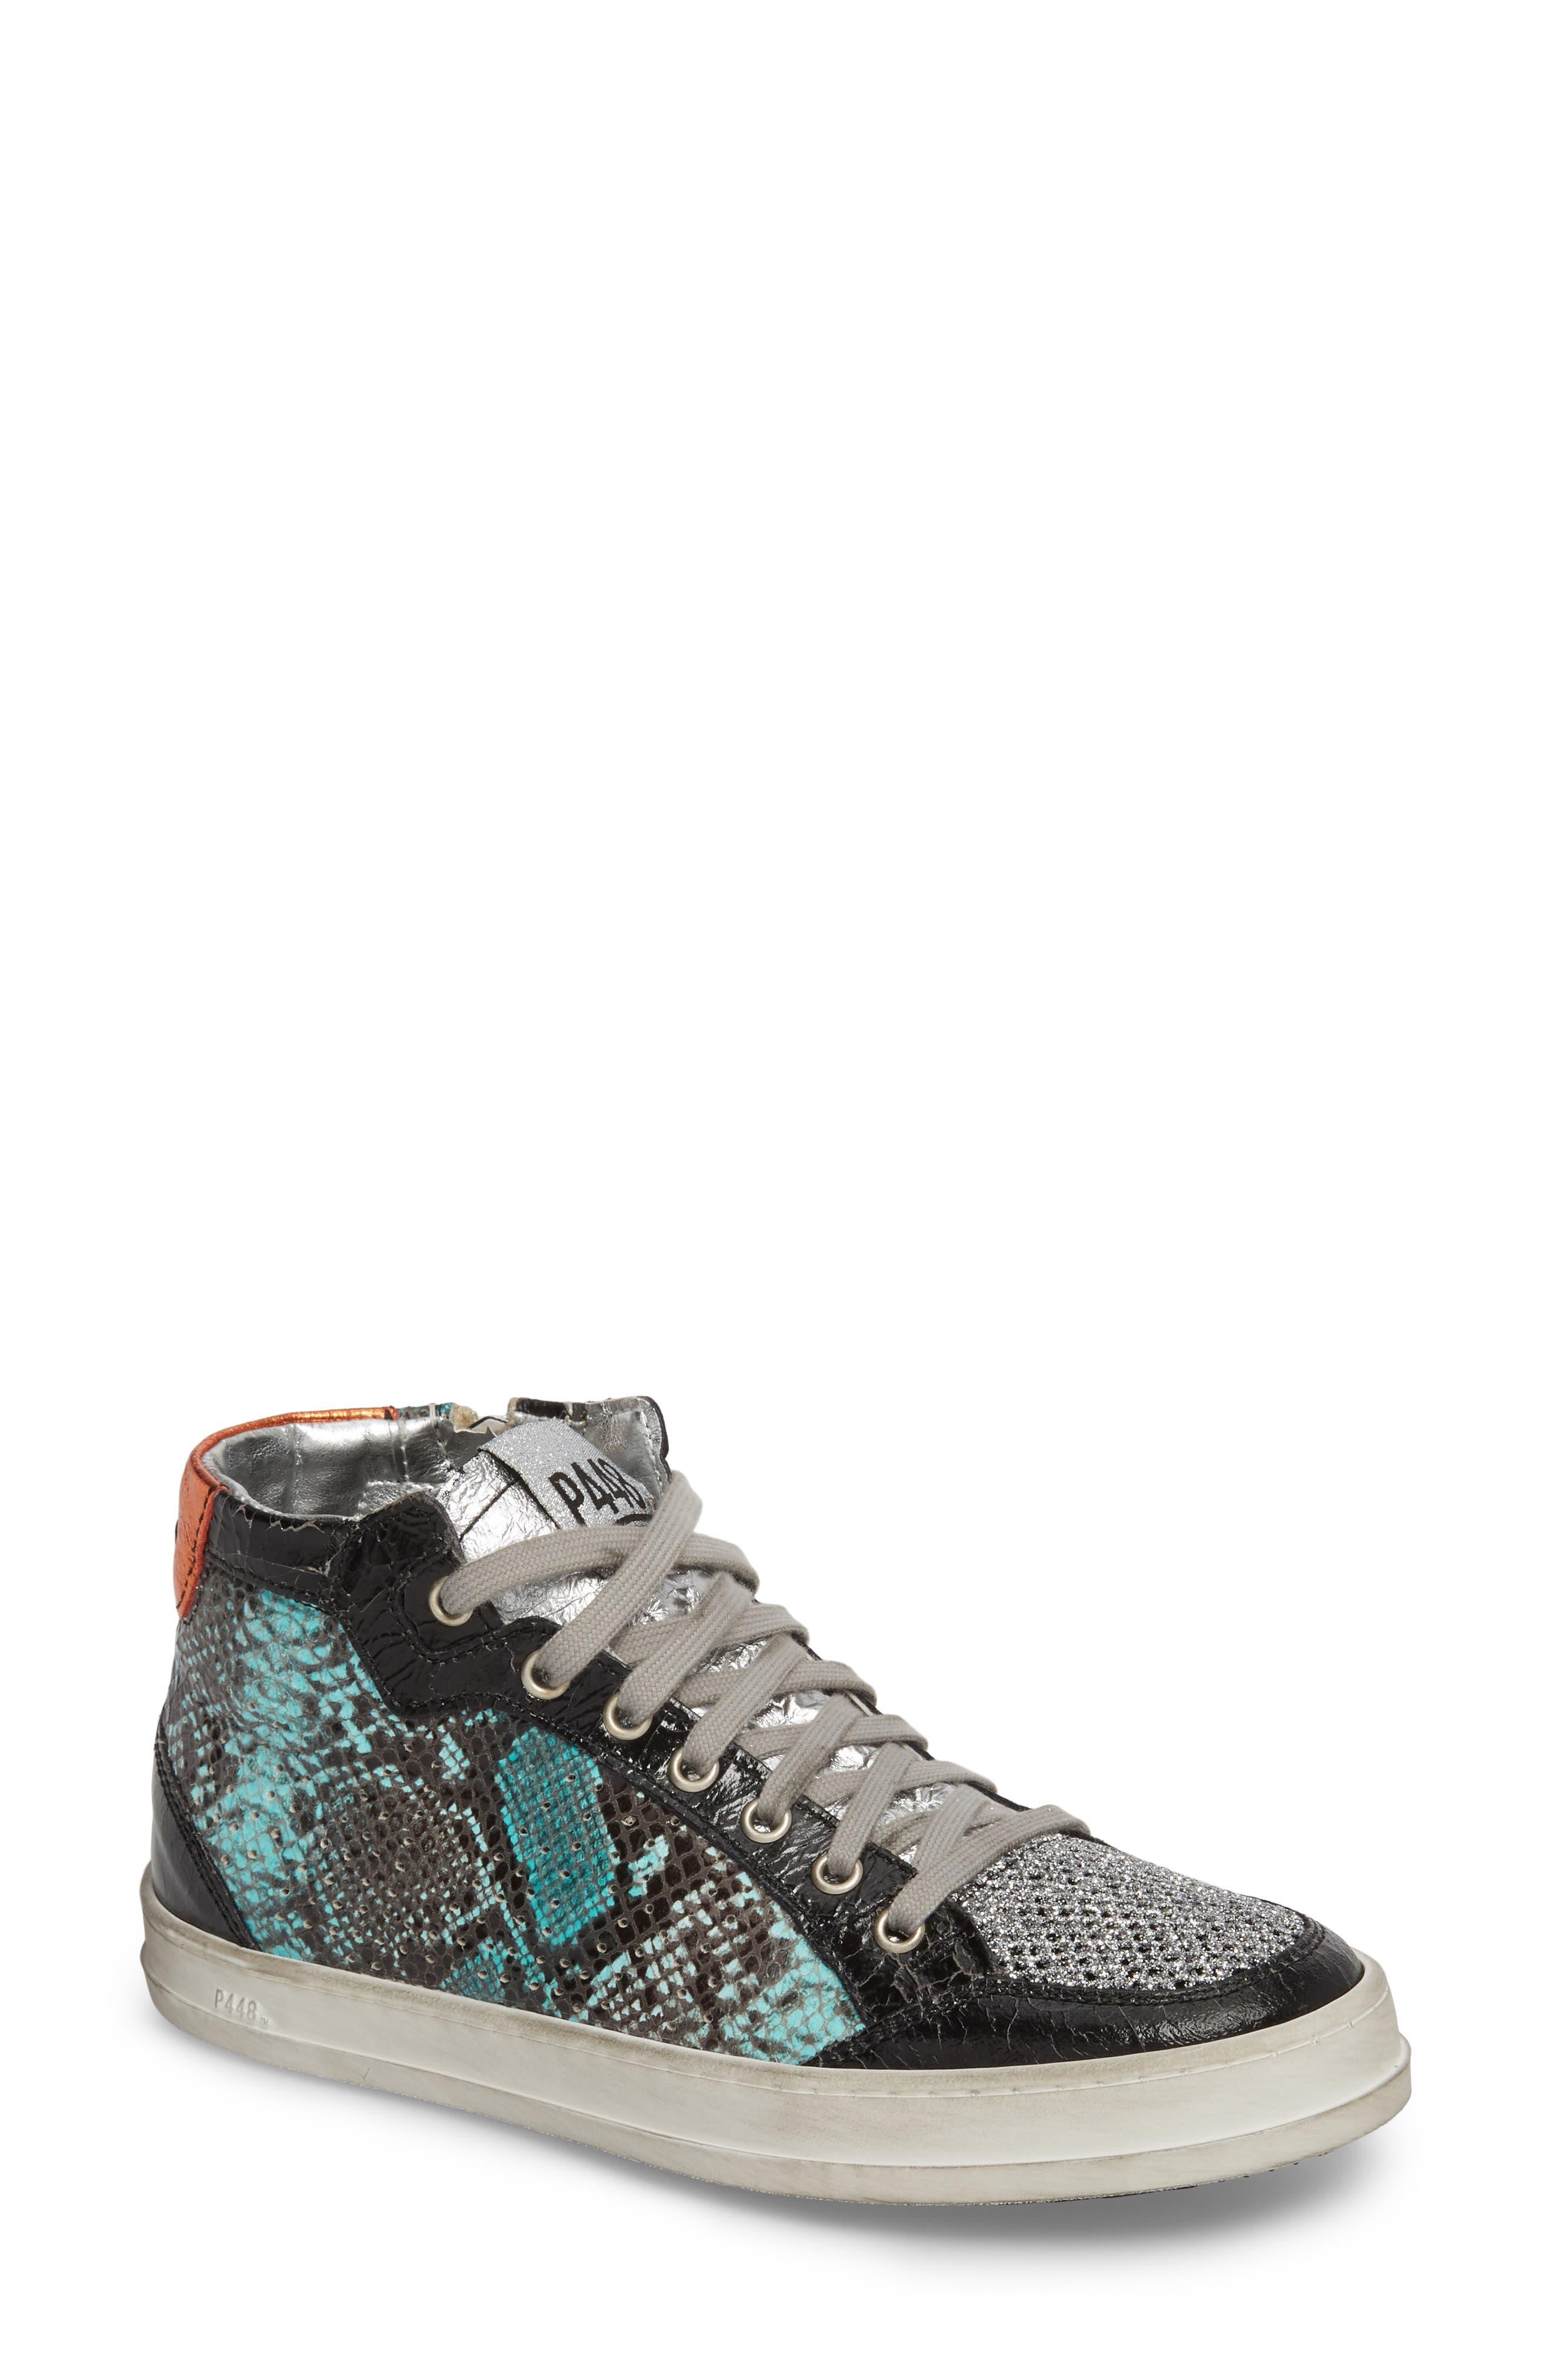 P448 Love High Top Sneaker (Women)